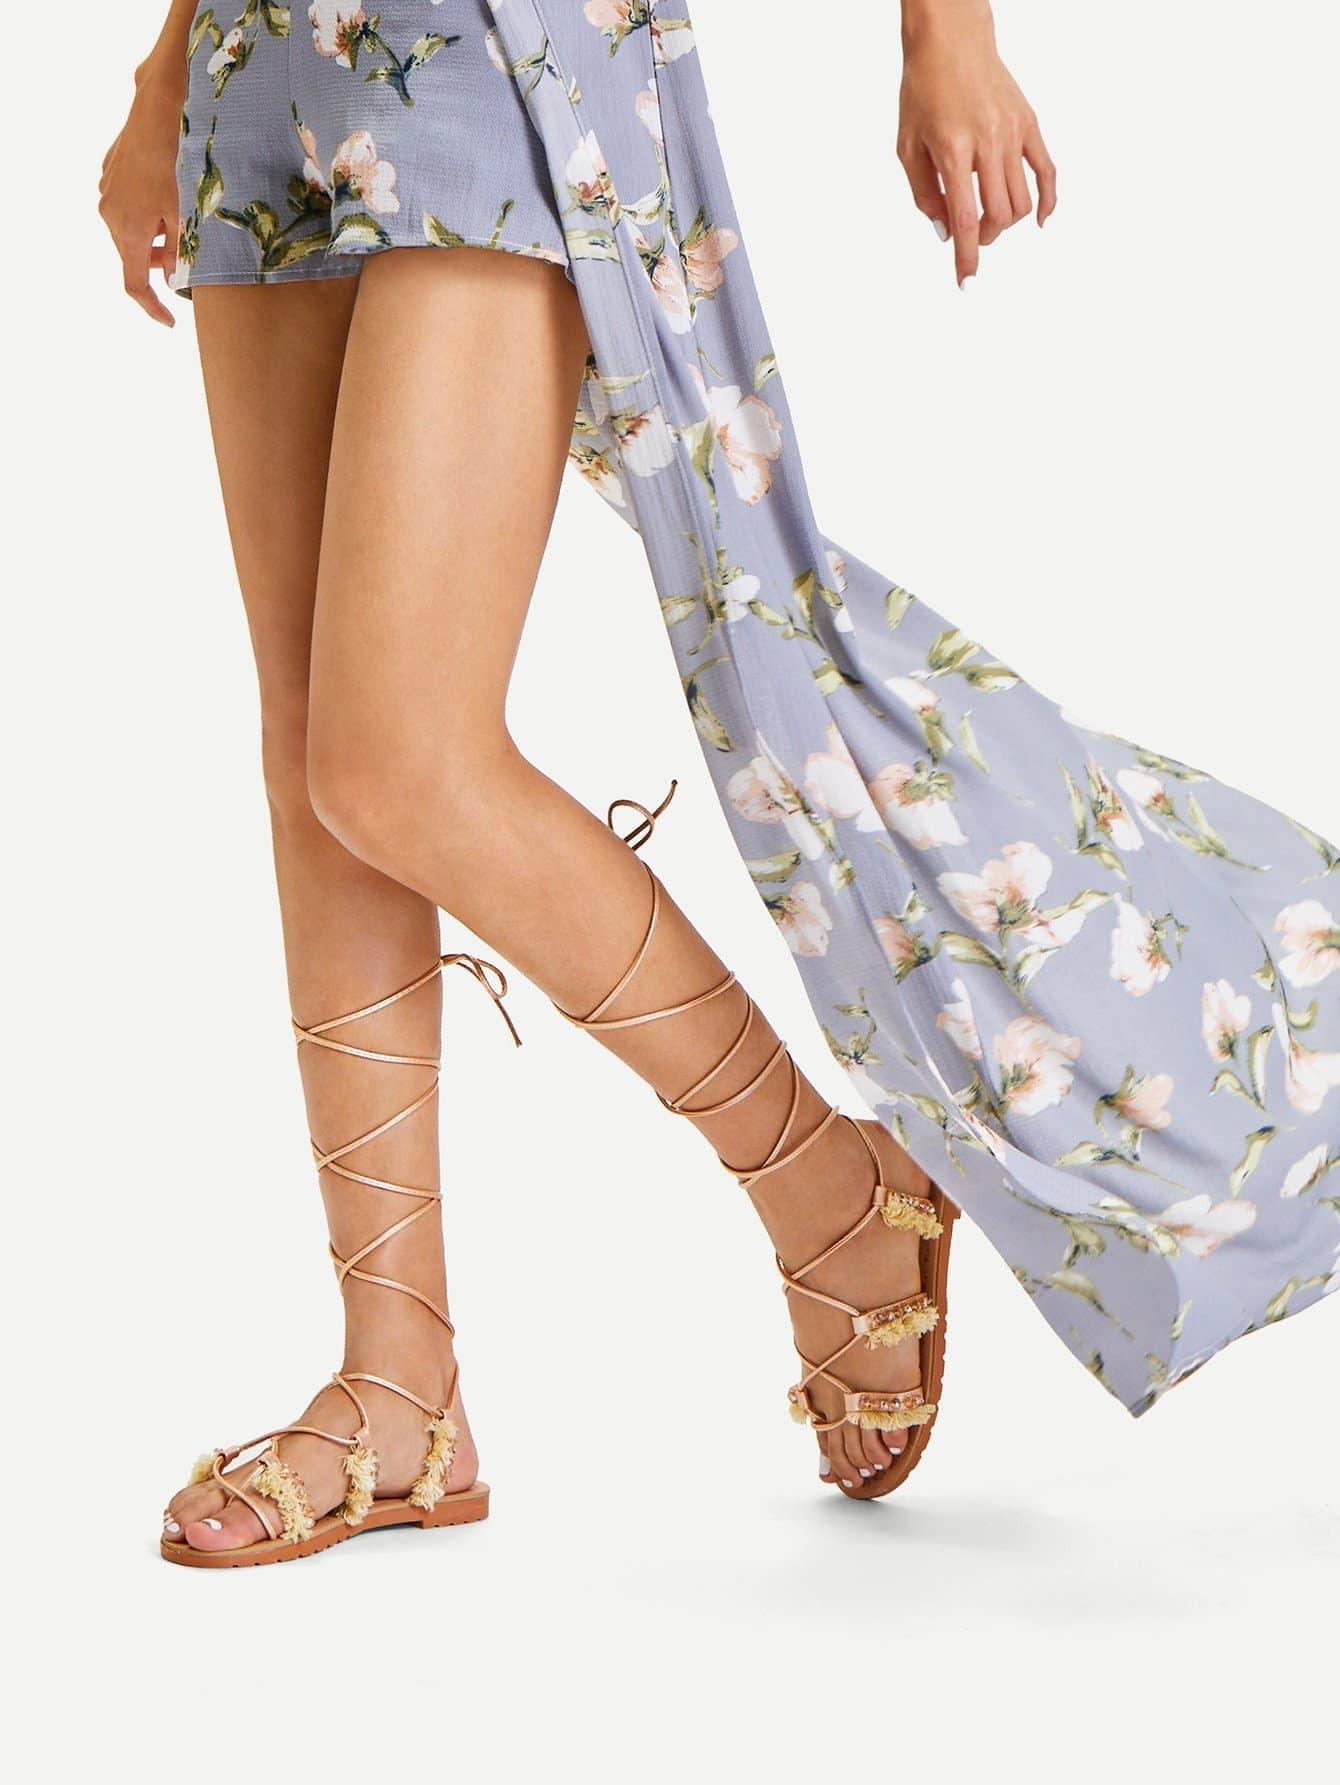 Fringe Detail Criss Cross PU Flat Sandals fringe detail beach sandals